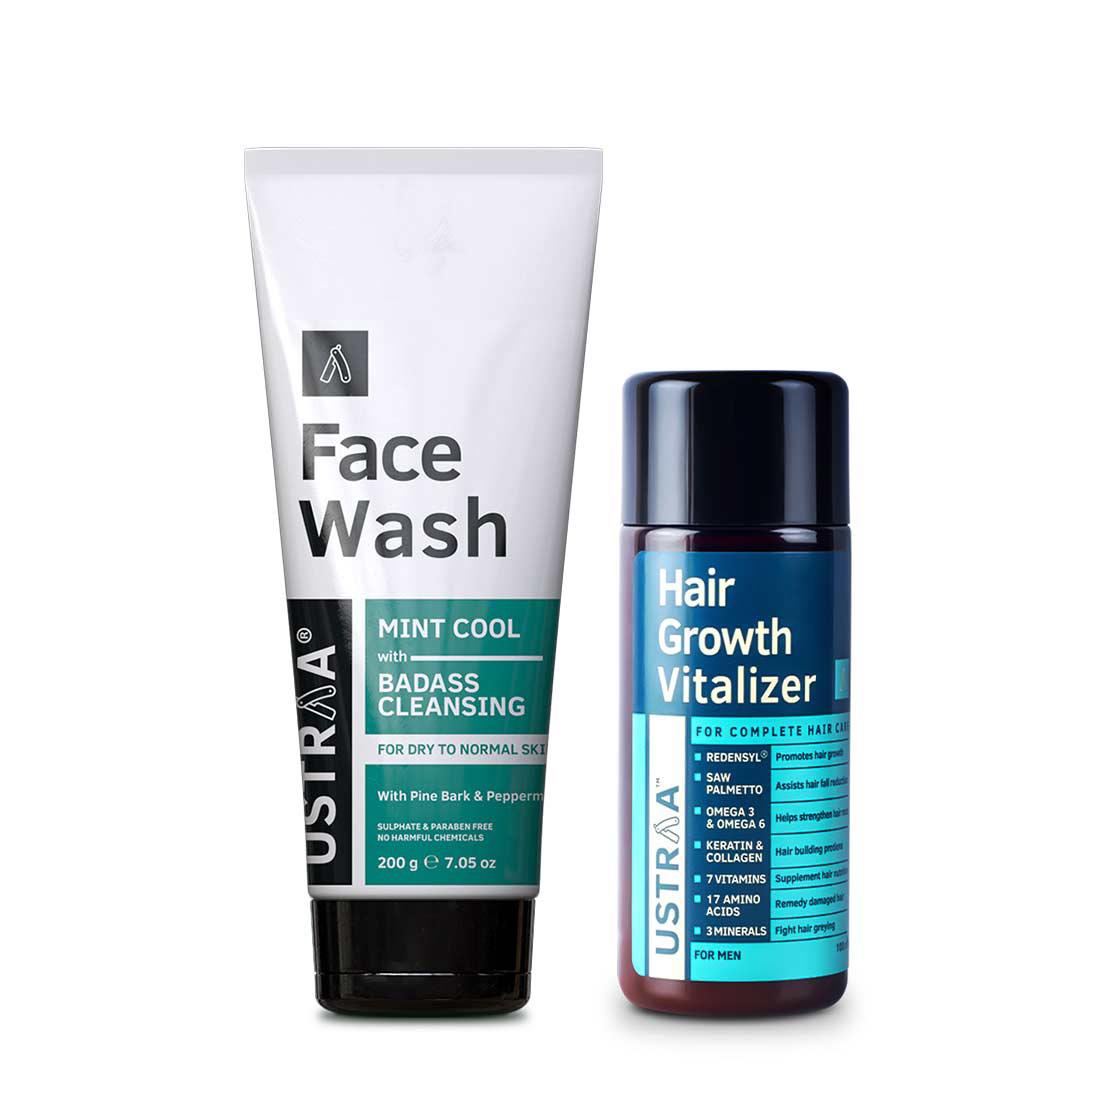 Ustraa | Ustraa Hair Growth Vitalizer 100 ml & Face Wash Dry Skin200g